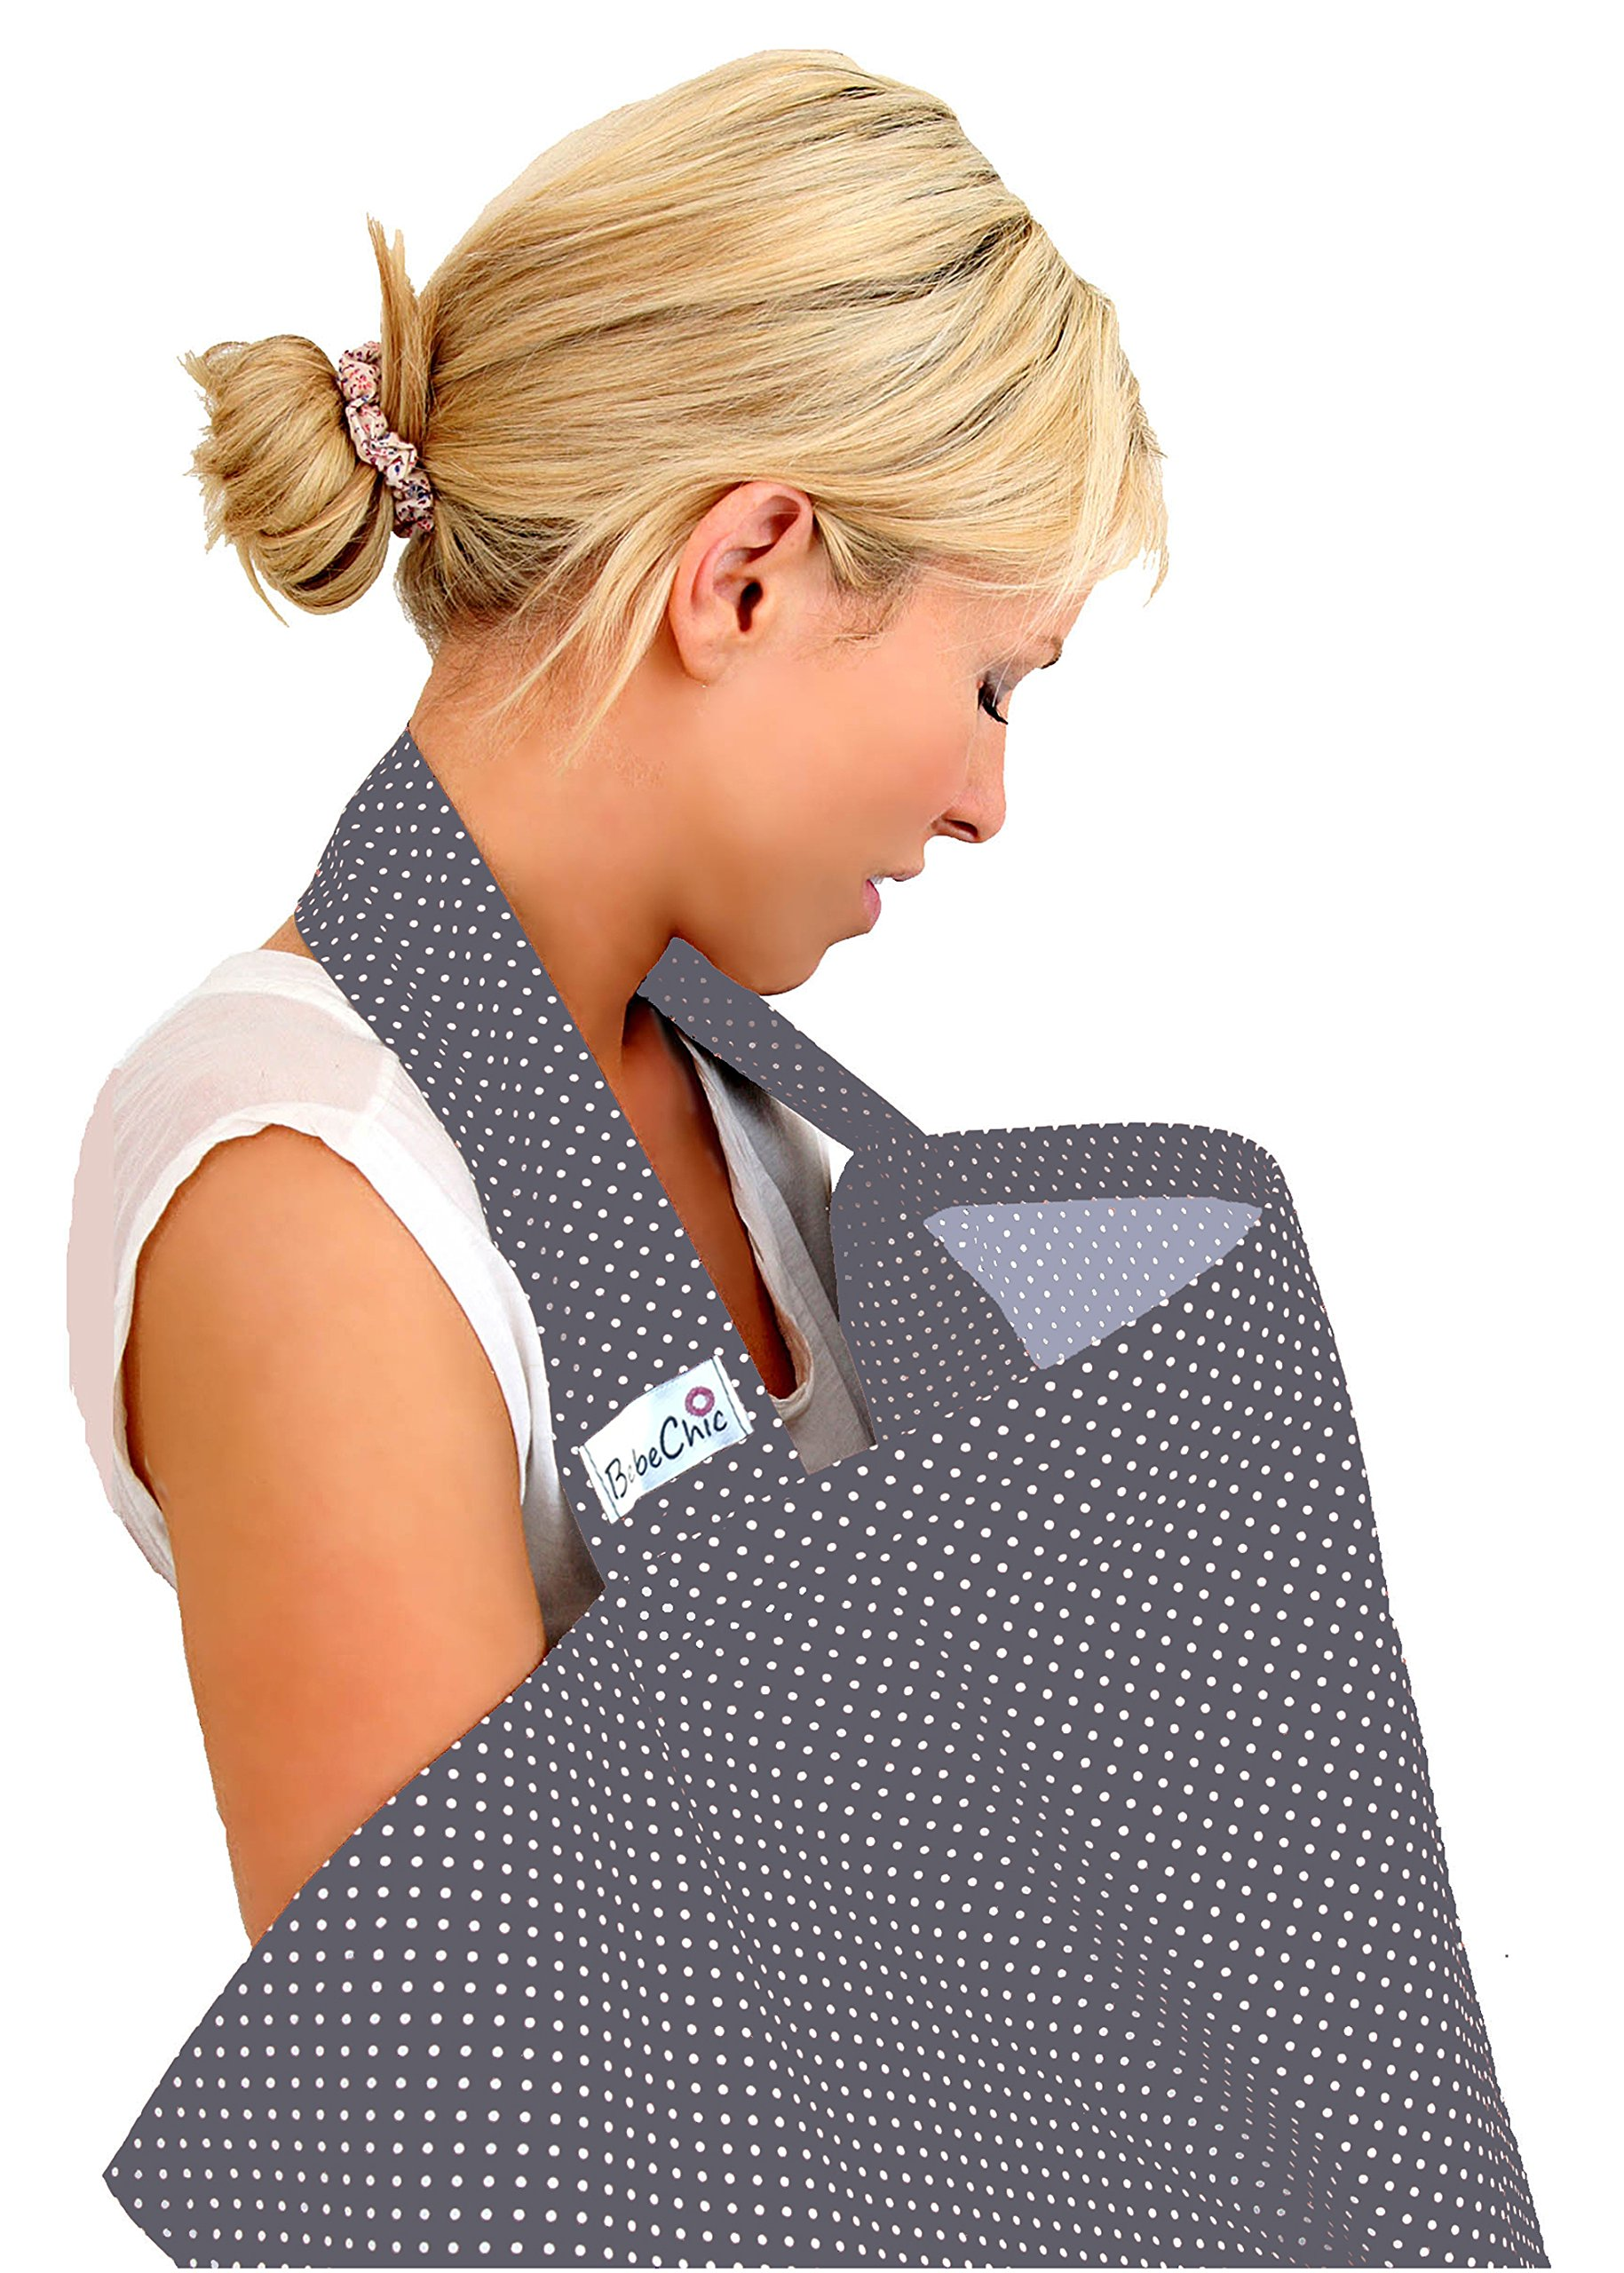 BebeChic.UK * Top Quality Oeko-Tex® Certified 100% Cotton * Breastfeeding Covers * Boned Nursing Tops - Slate Grey/White dot